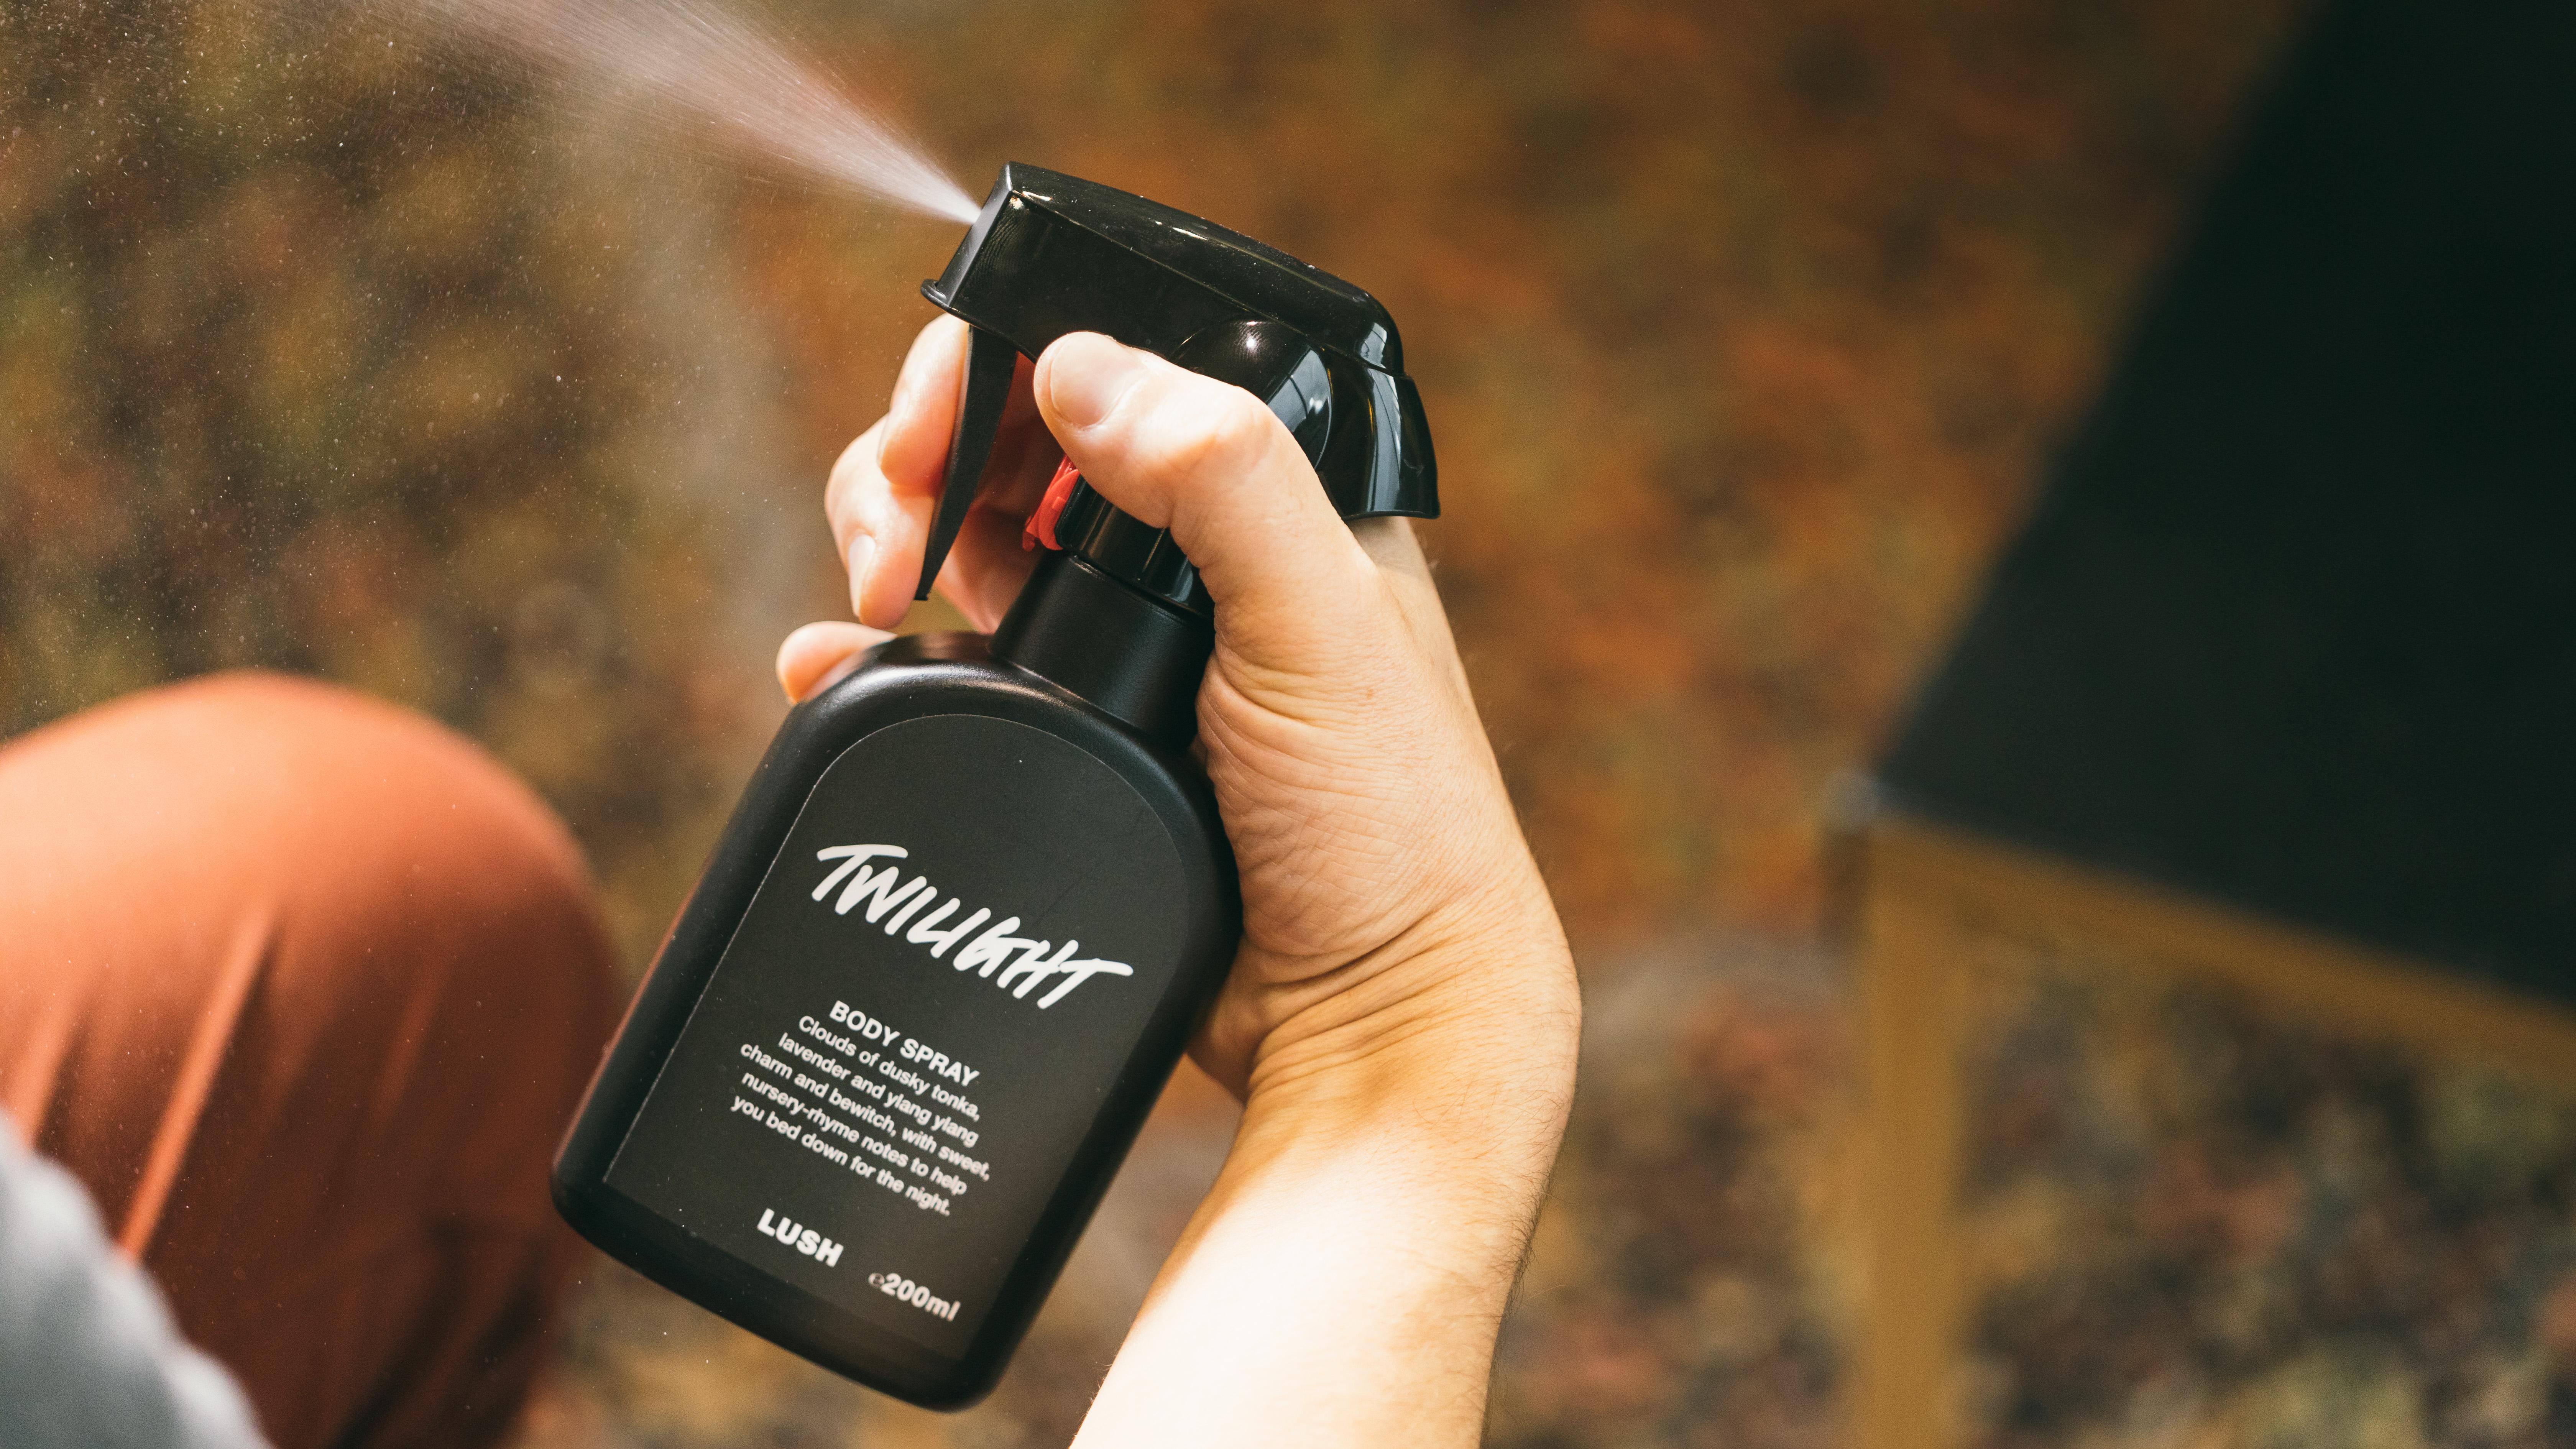 Twilight geuren body sprays lavendel lush nederland